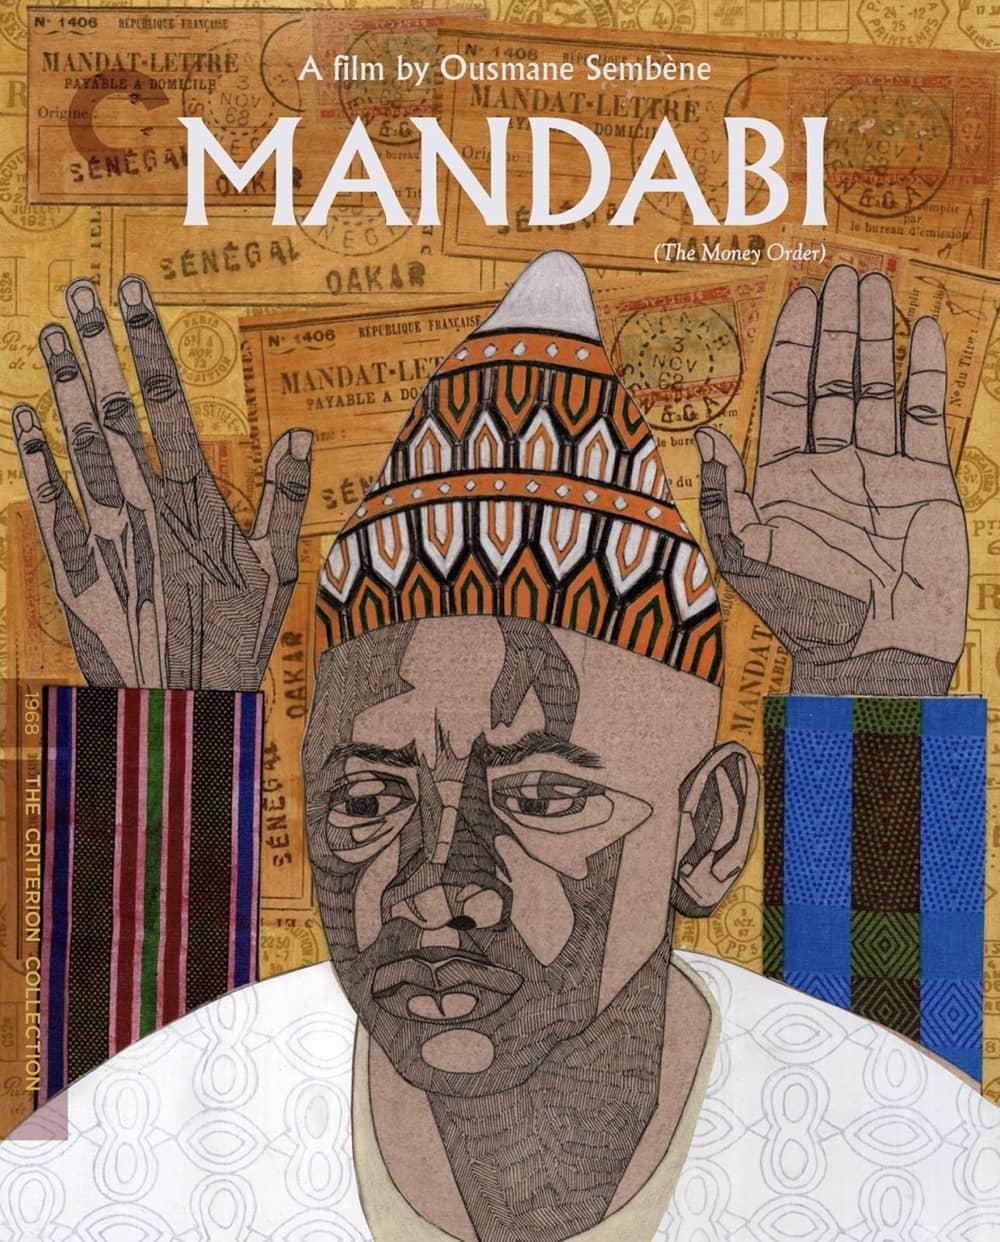 Mandabi Criterion Collection Bluray Cover